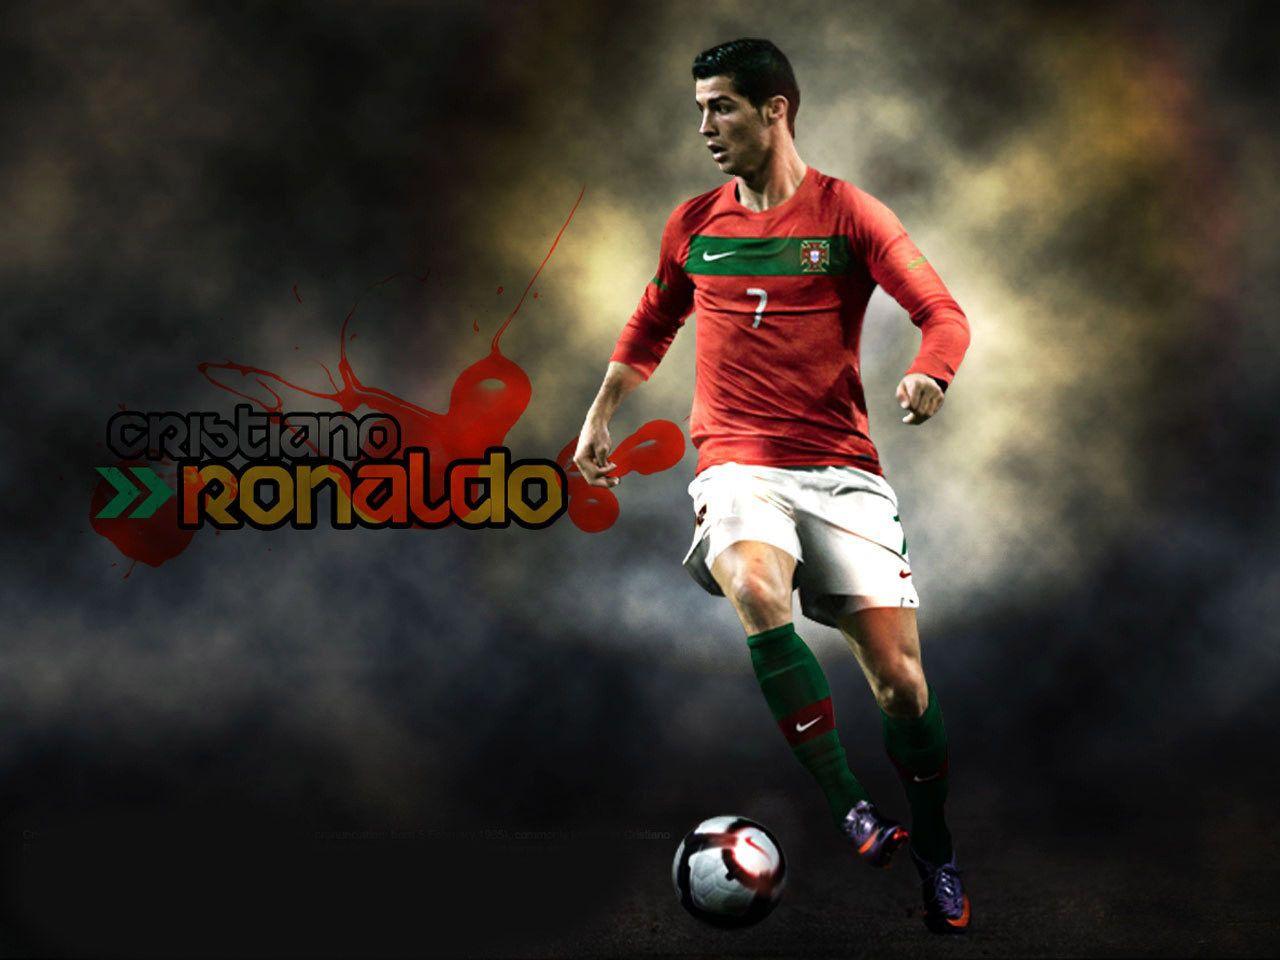 Football Wallpapers Hd Wallpaper 1024 768 Football Players Wallpapers 51 Wallpapers Adorable Wallpapers Cristiano Ronaldo Ronaldo Ronaldo Soccer Player